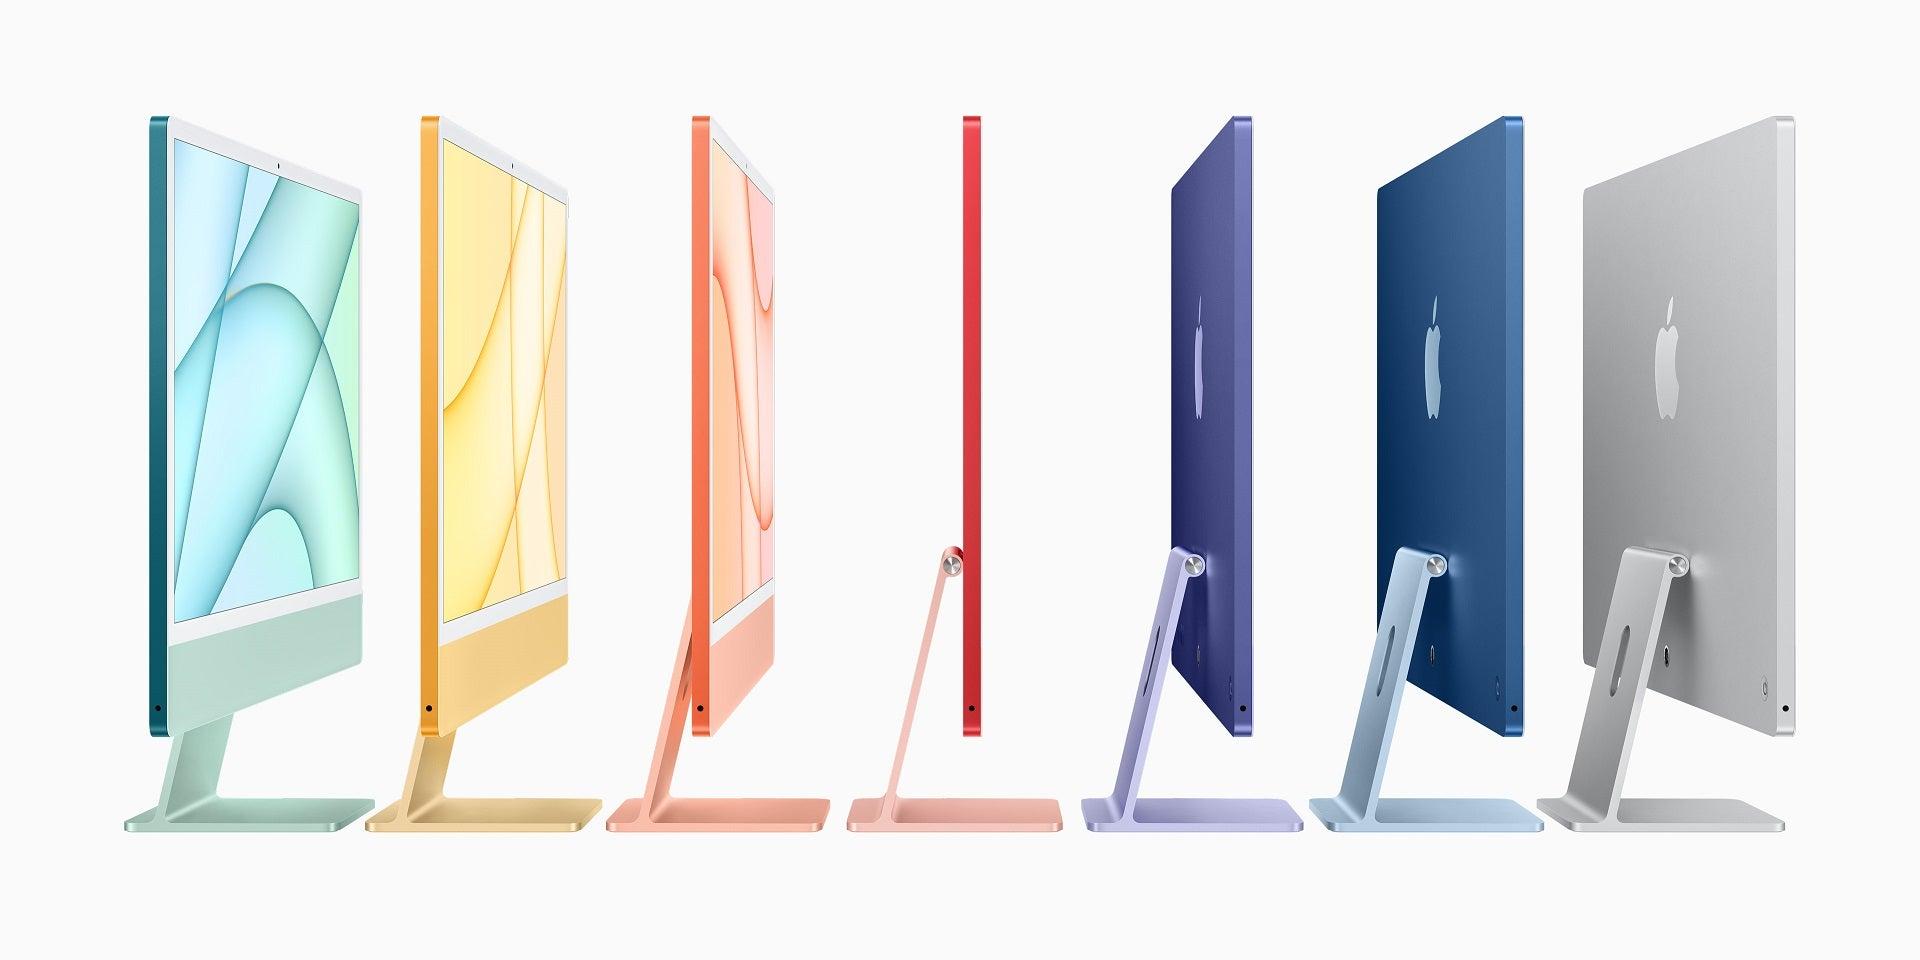 Apple: new iMac